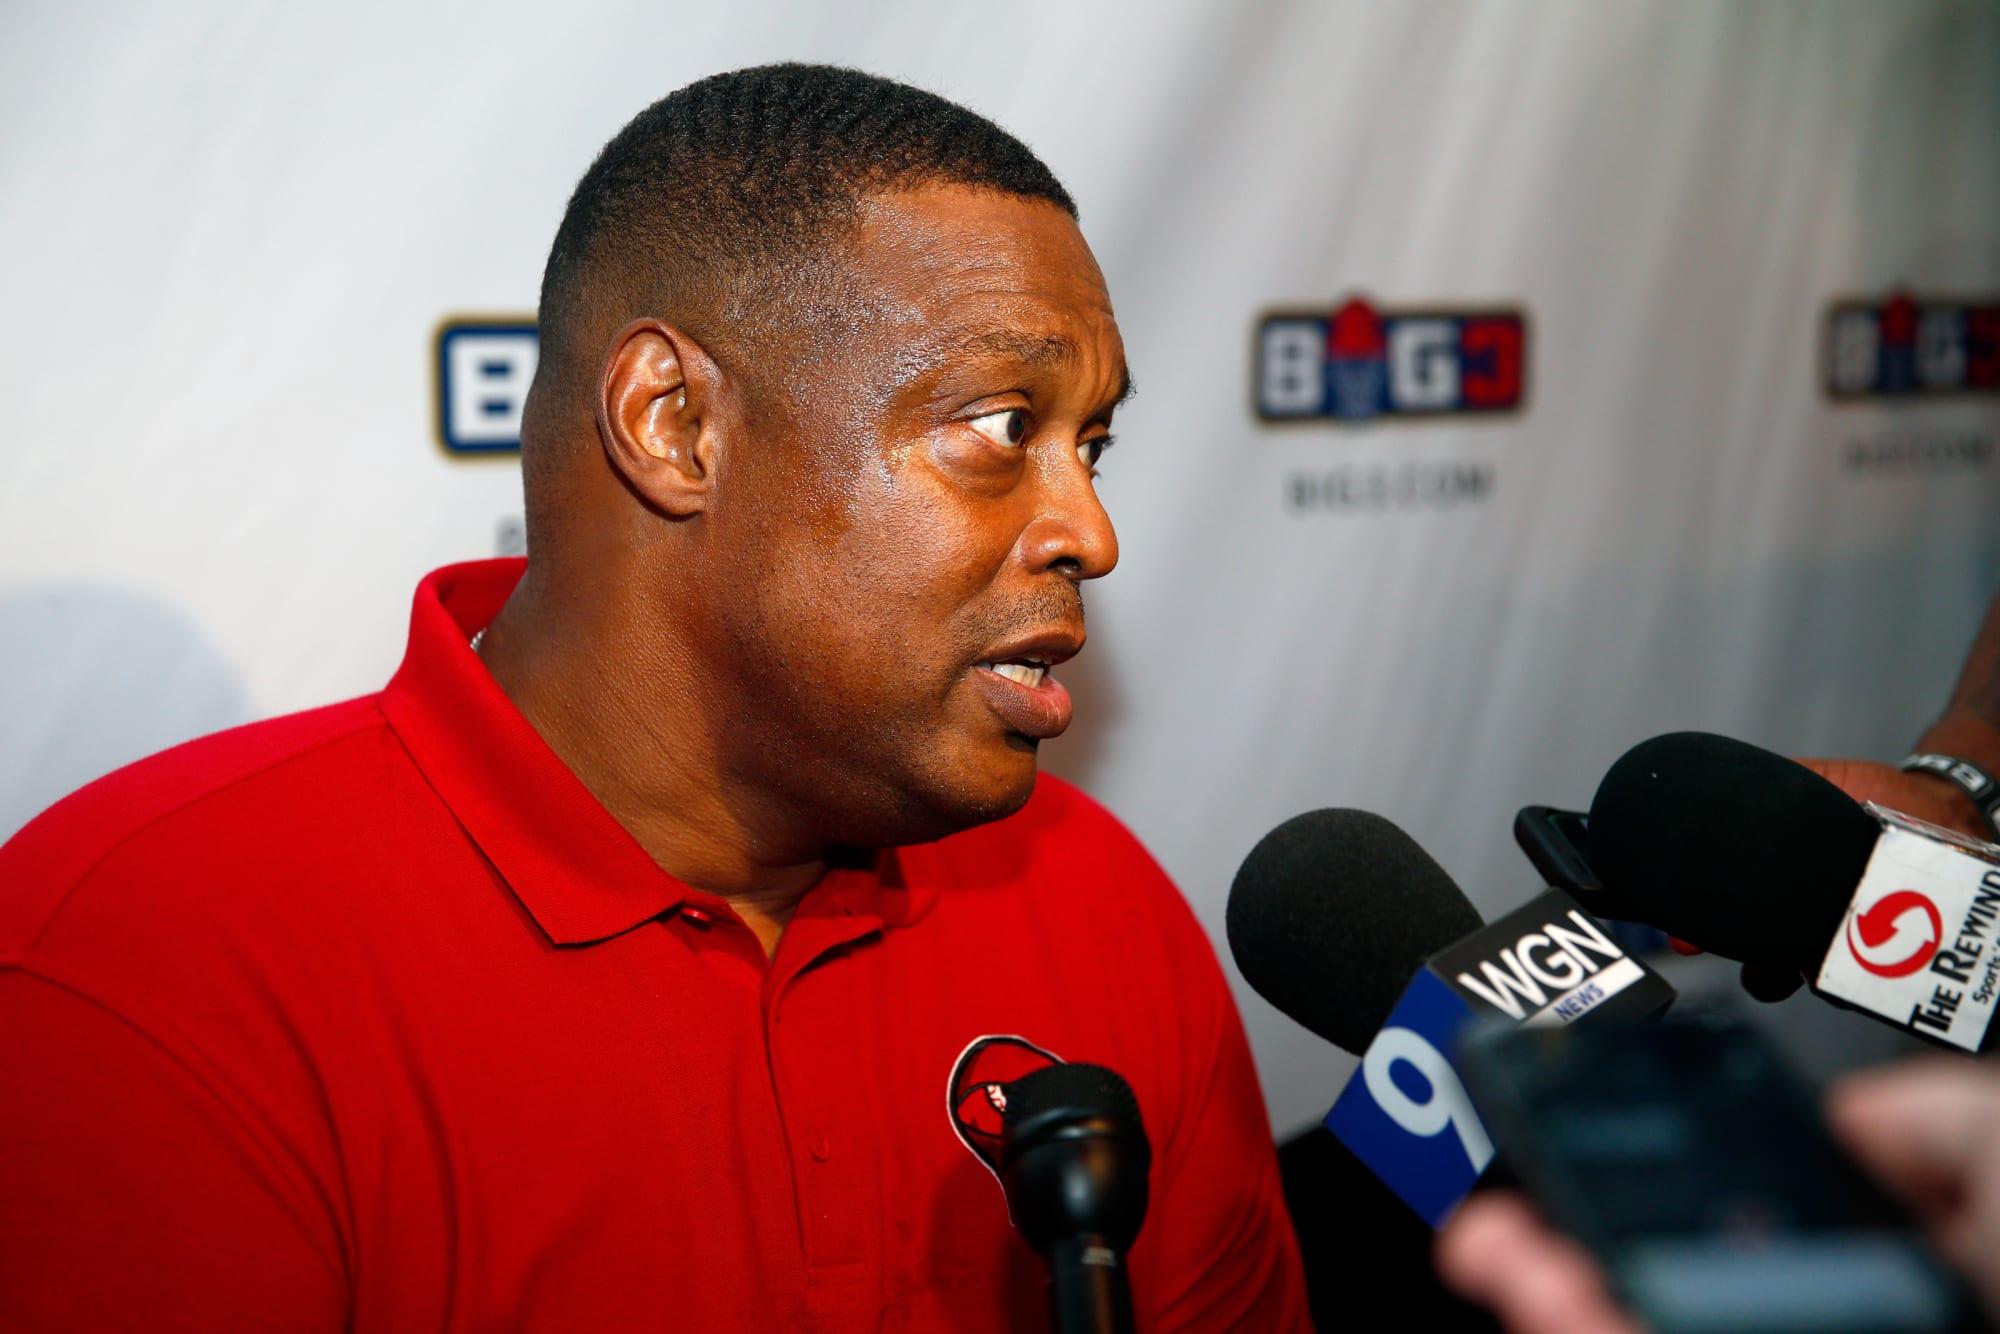 Rick Mahorn bashes Rockets' Daryl Morey's analytical approach